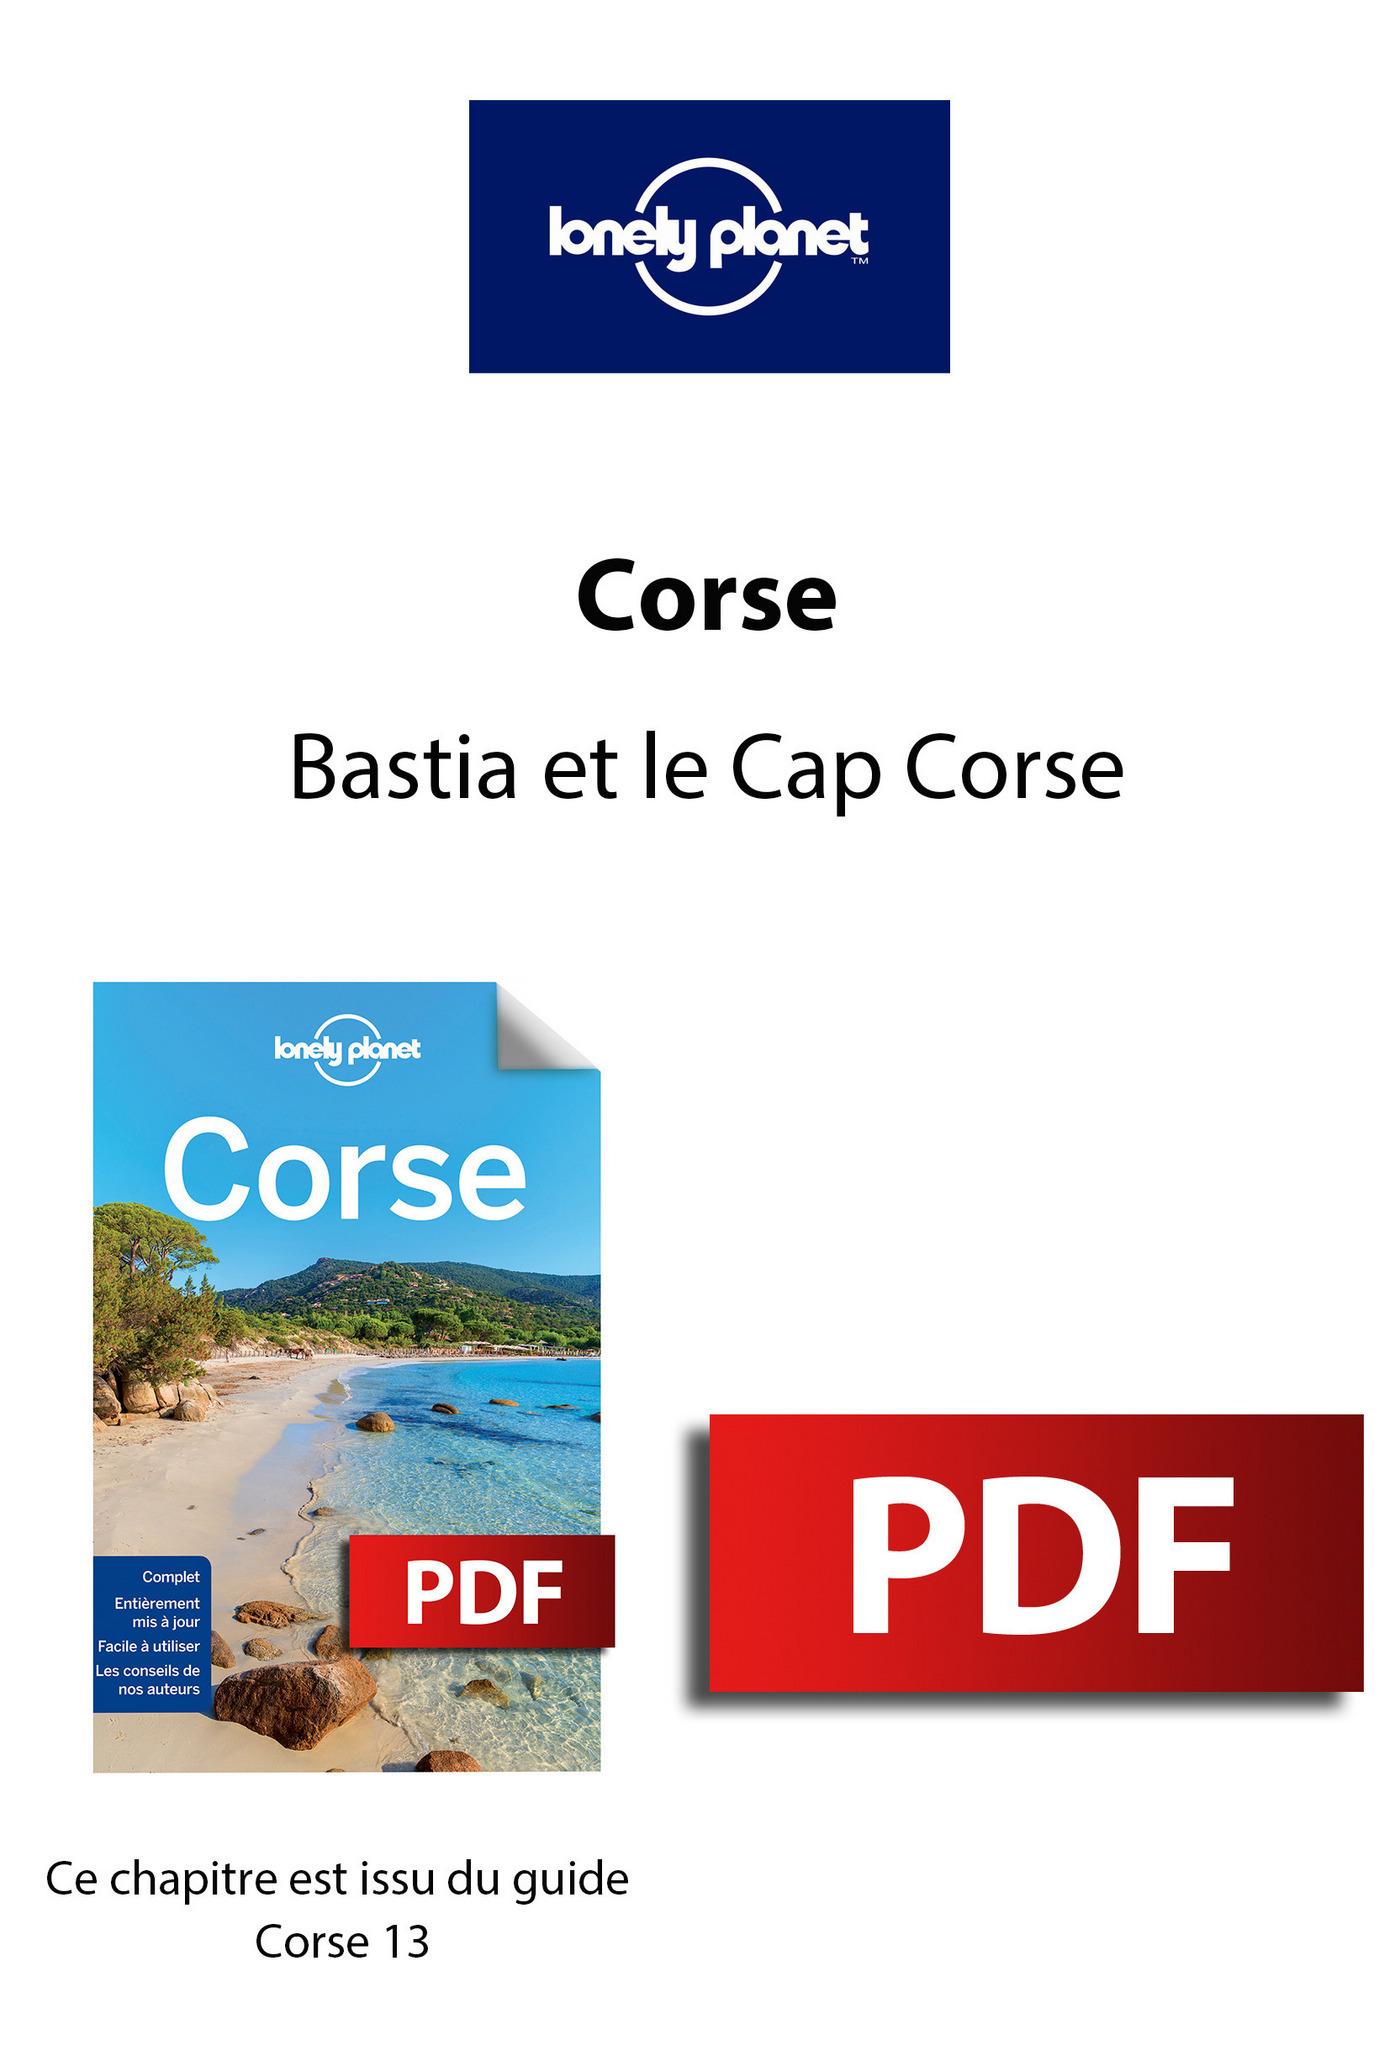 Corse - Bastia et le Cap Corse